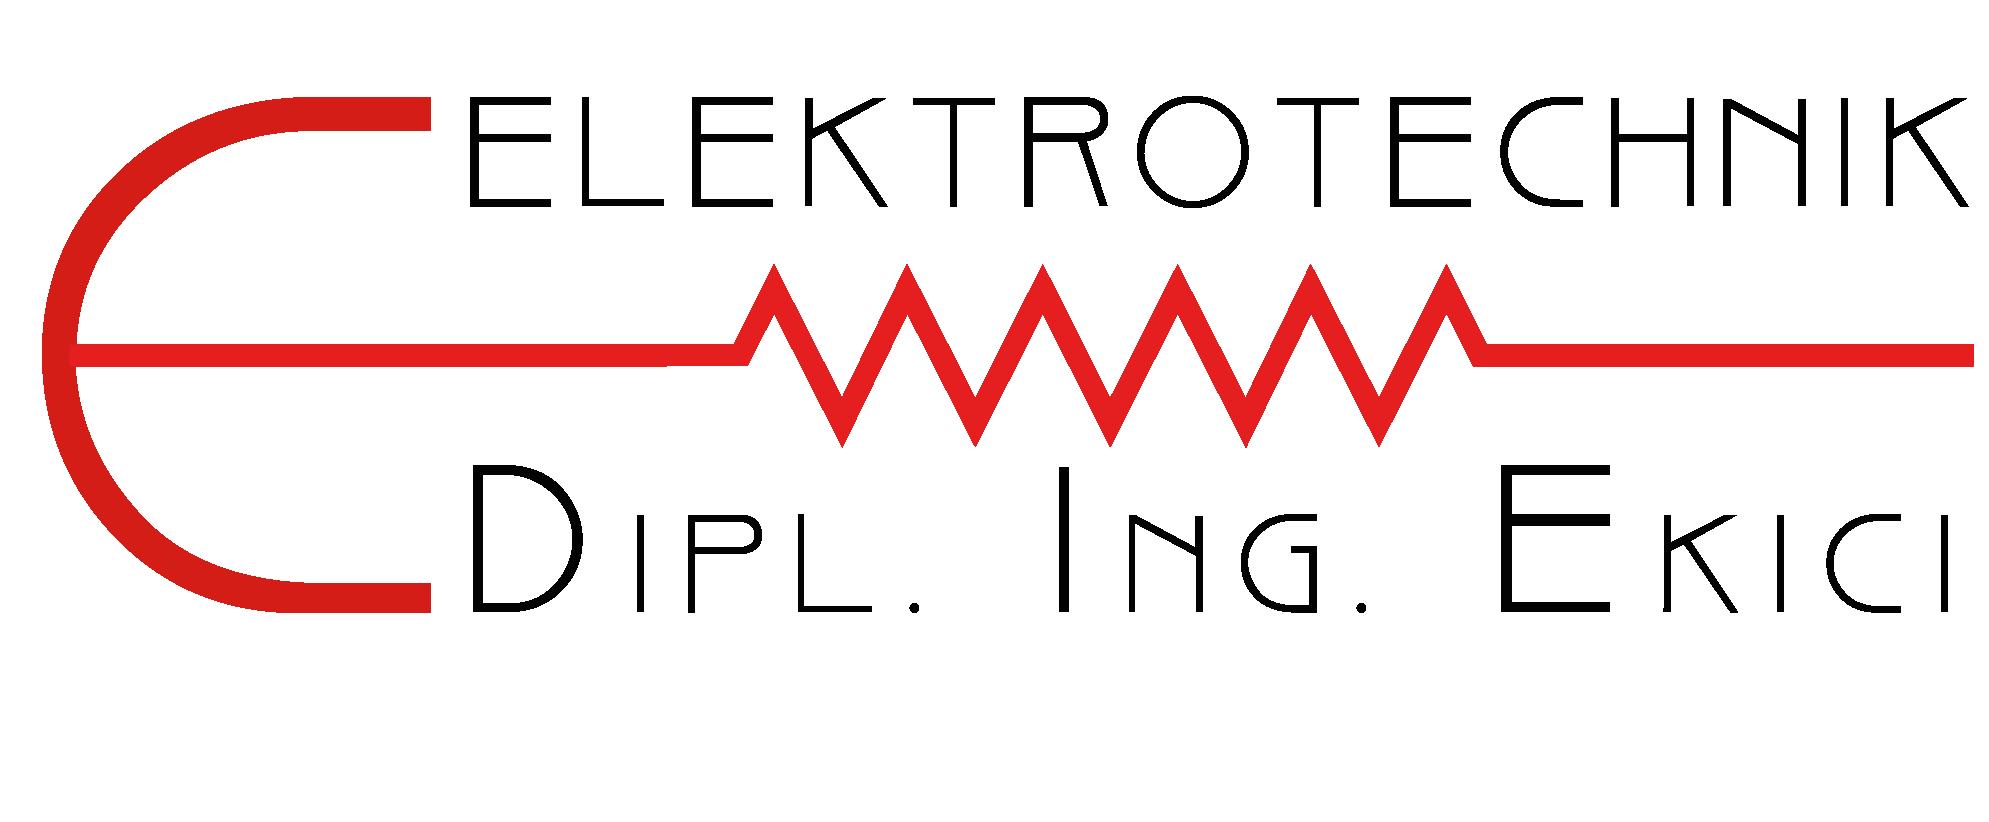 Elektroinstallationen / Elektriker Wien / Störungsdienst Wien